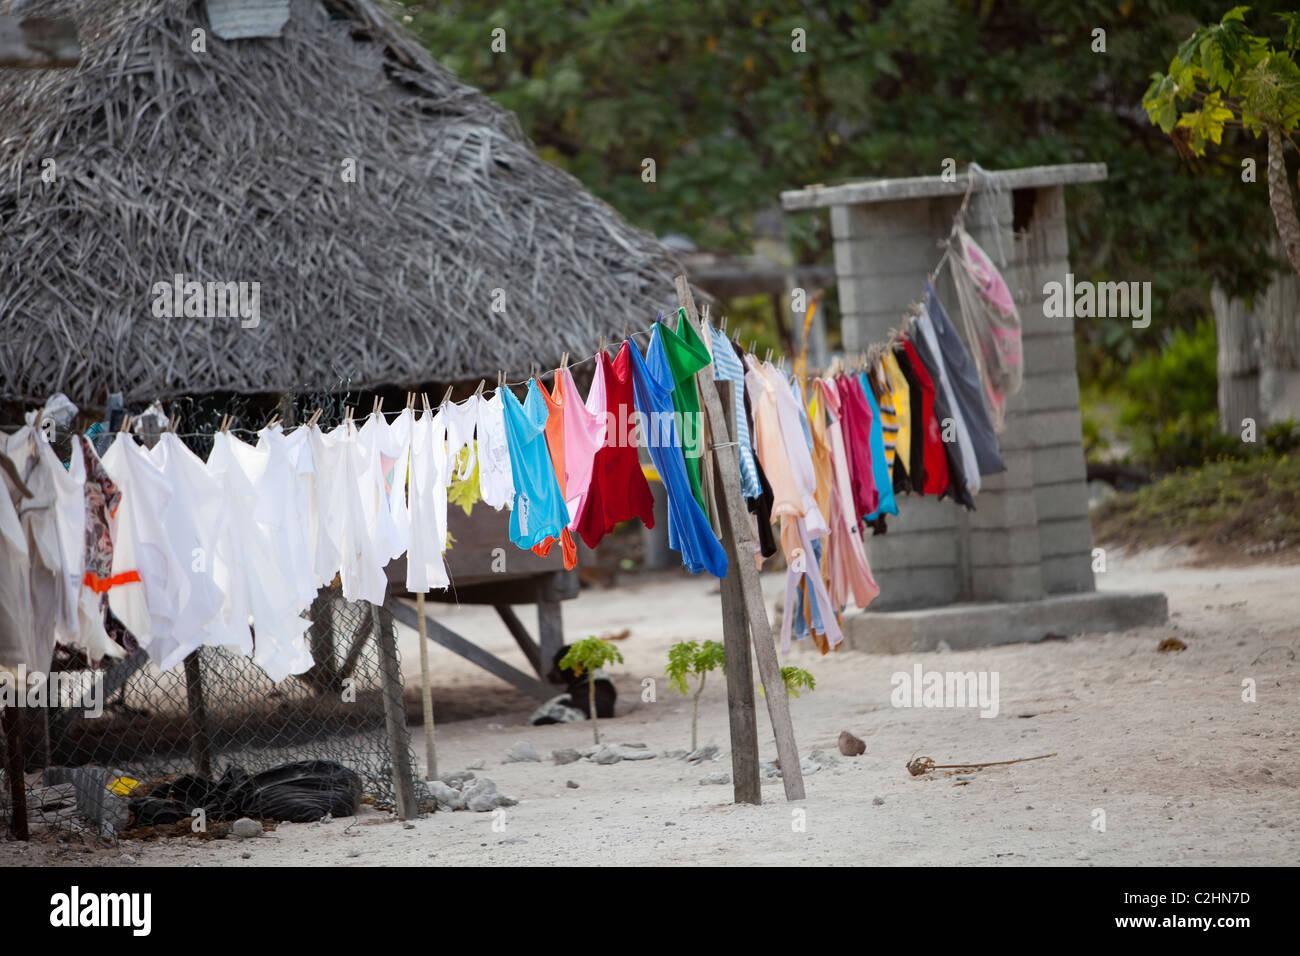 Kiritimati, Kiribati, Christmas Island, village scene - Stock Image